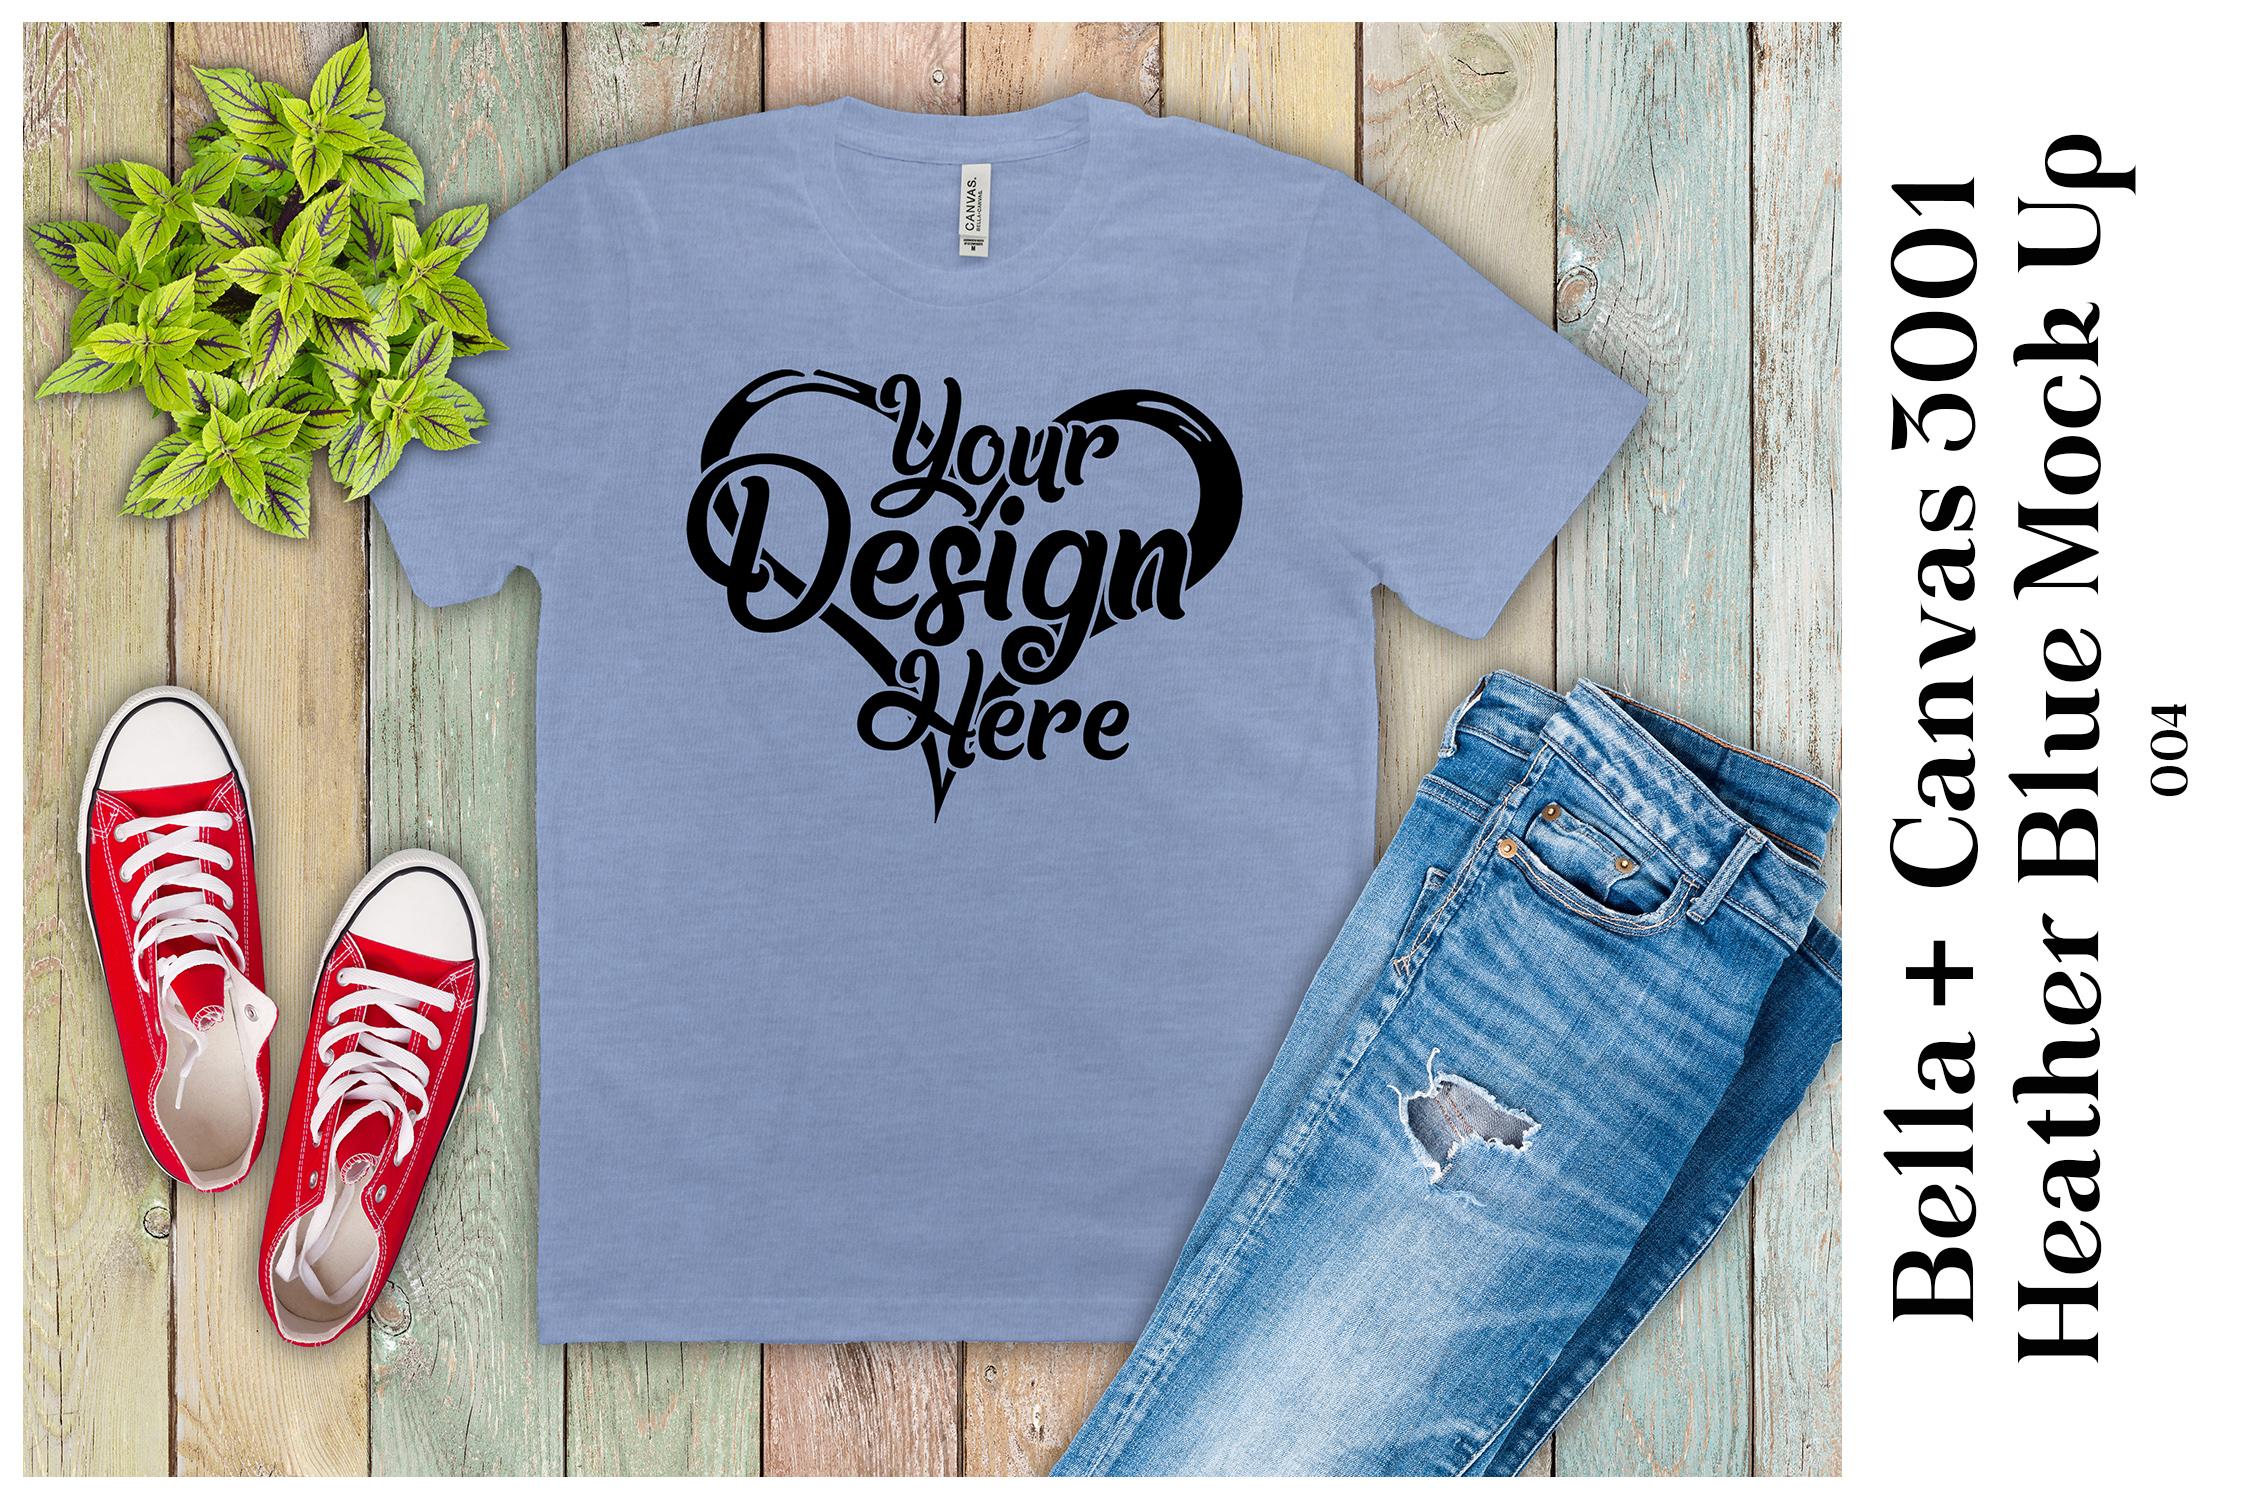 Mens T-Shirt Mockup Heather Blue Bella Canvas 3001 Mock Up example image 1